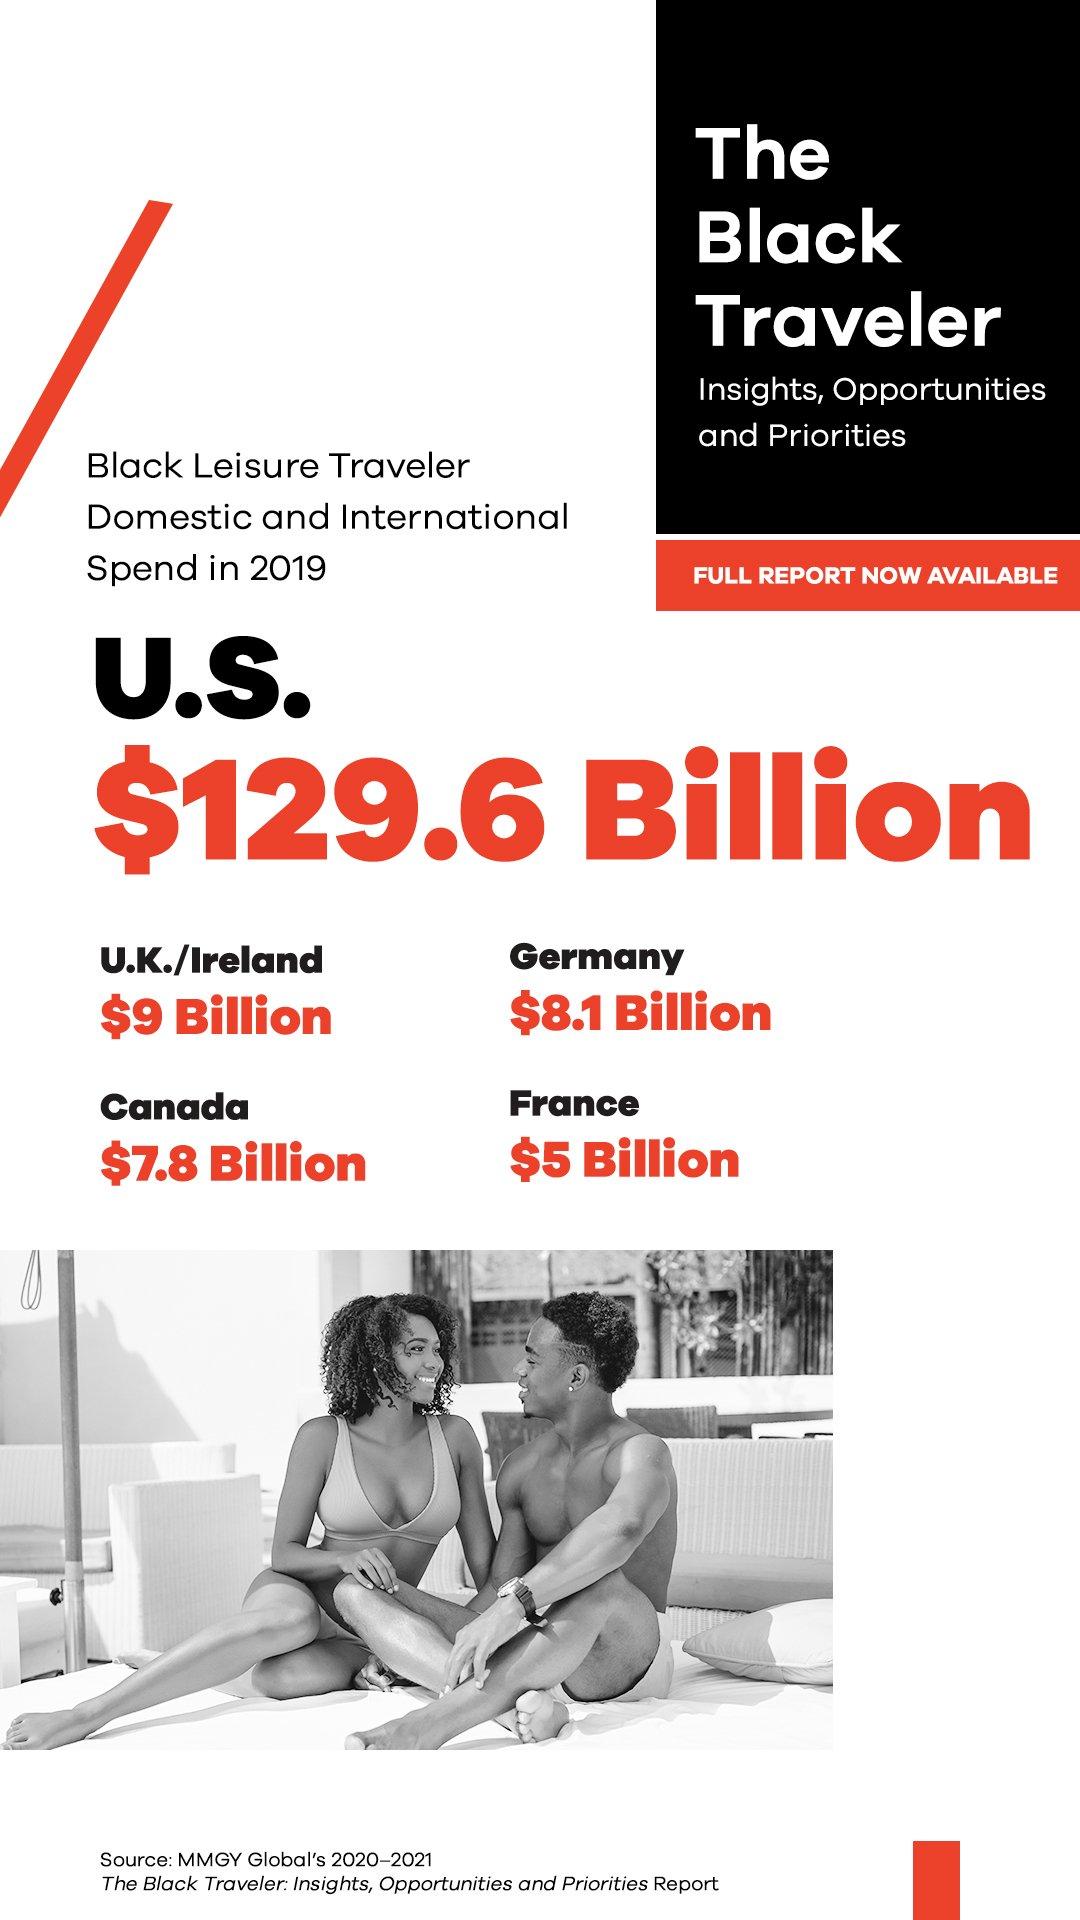 Black U.S. Leisure Travelers Spent $129.6 Billion on Domestic and International Travel in 2019